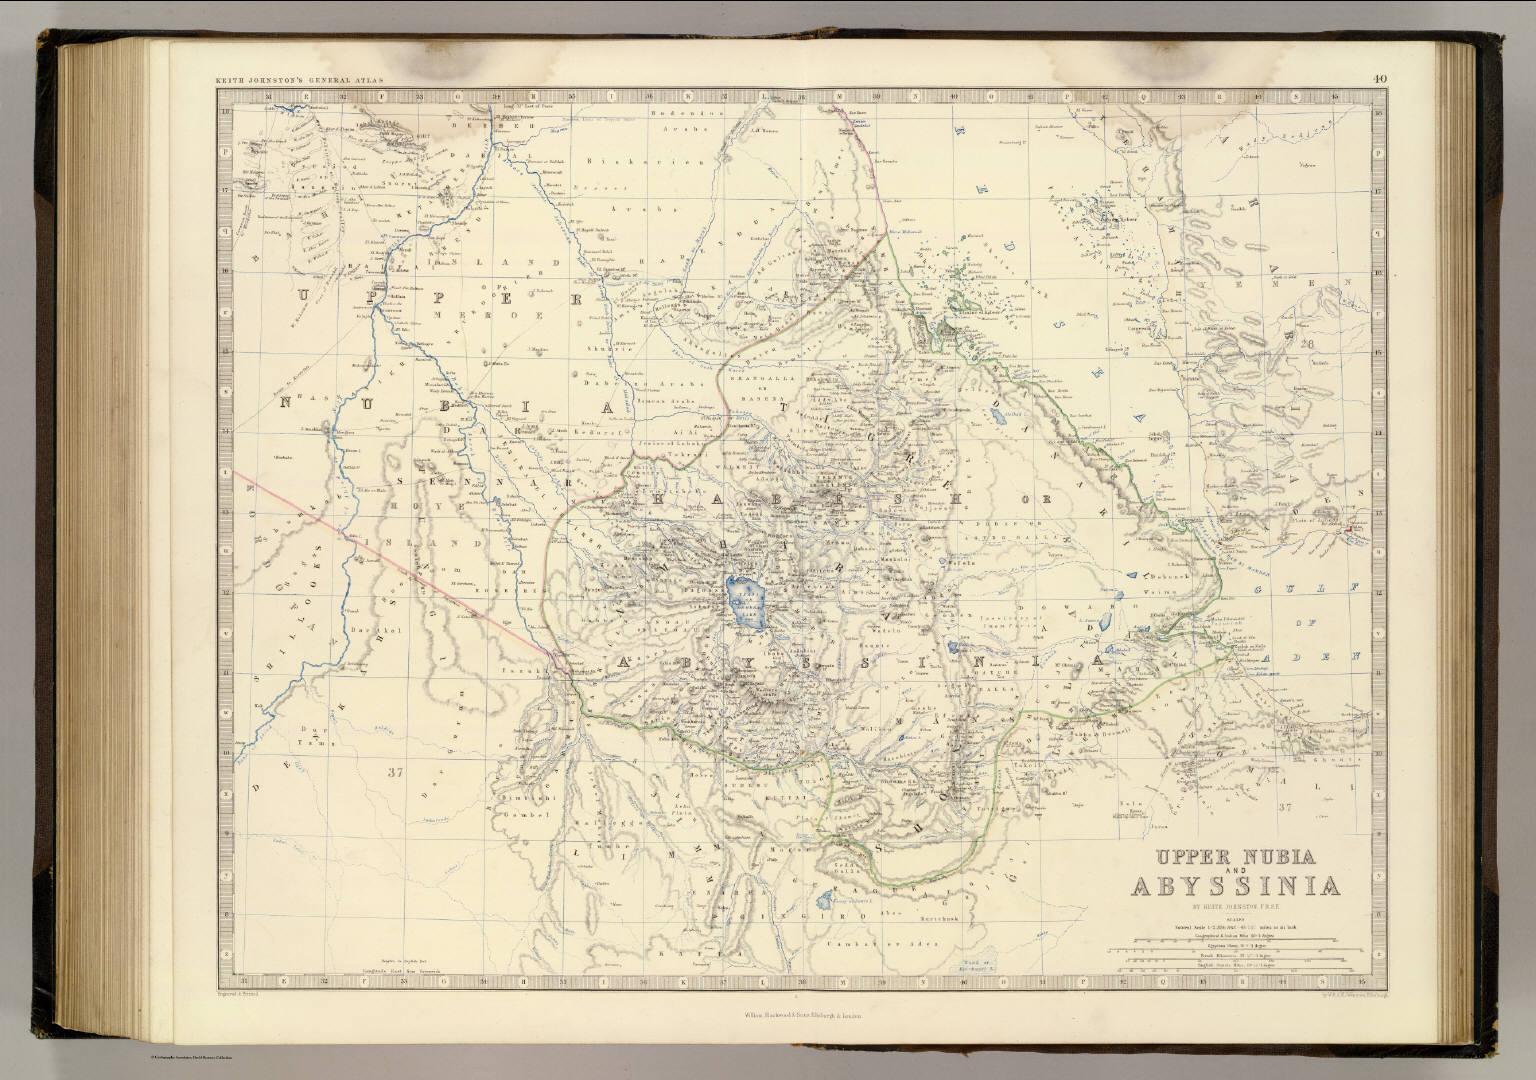 Nubia, Abyssinia.